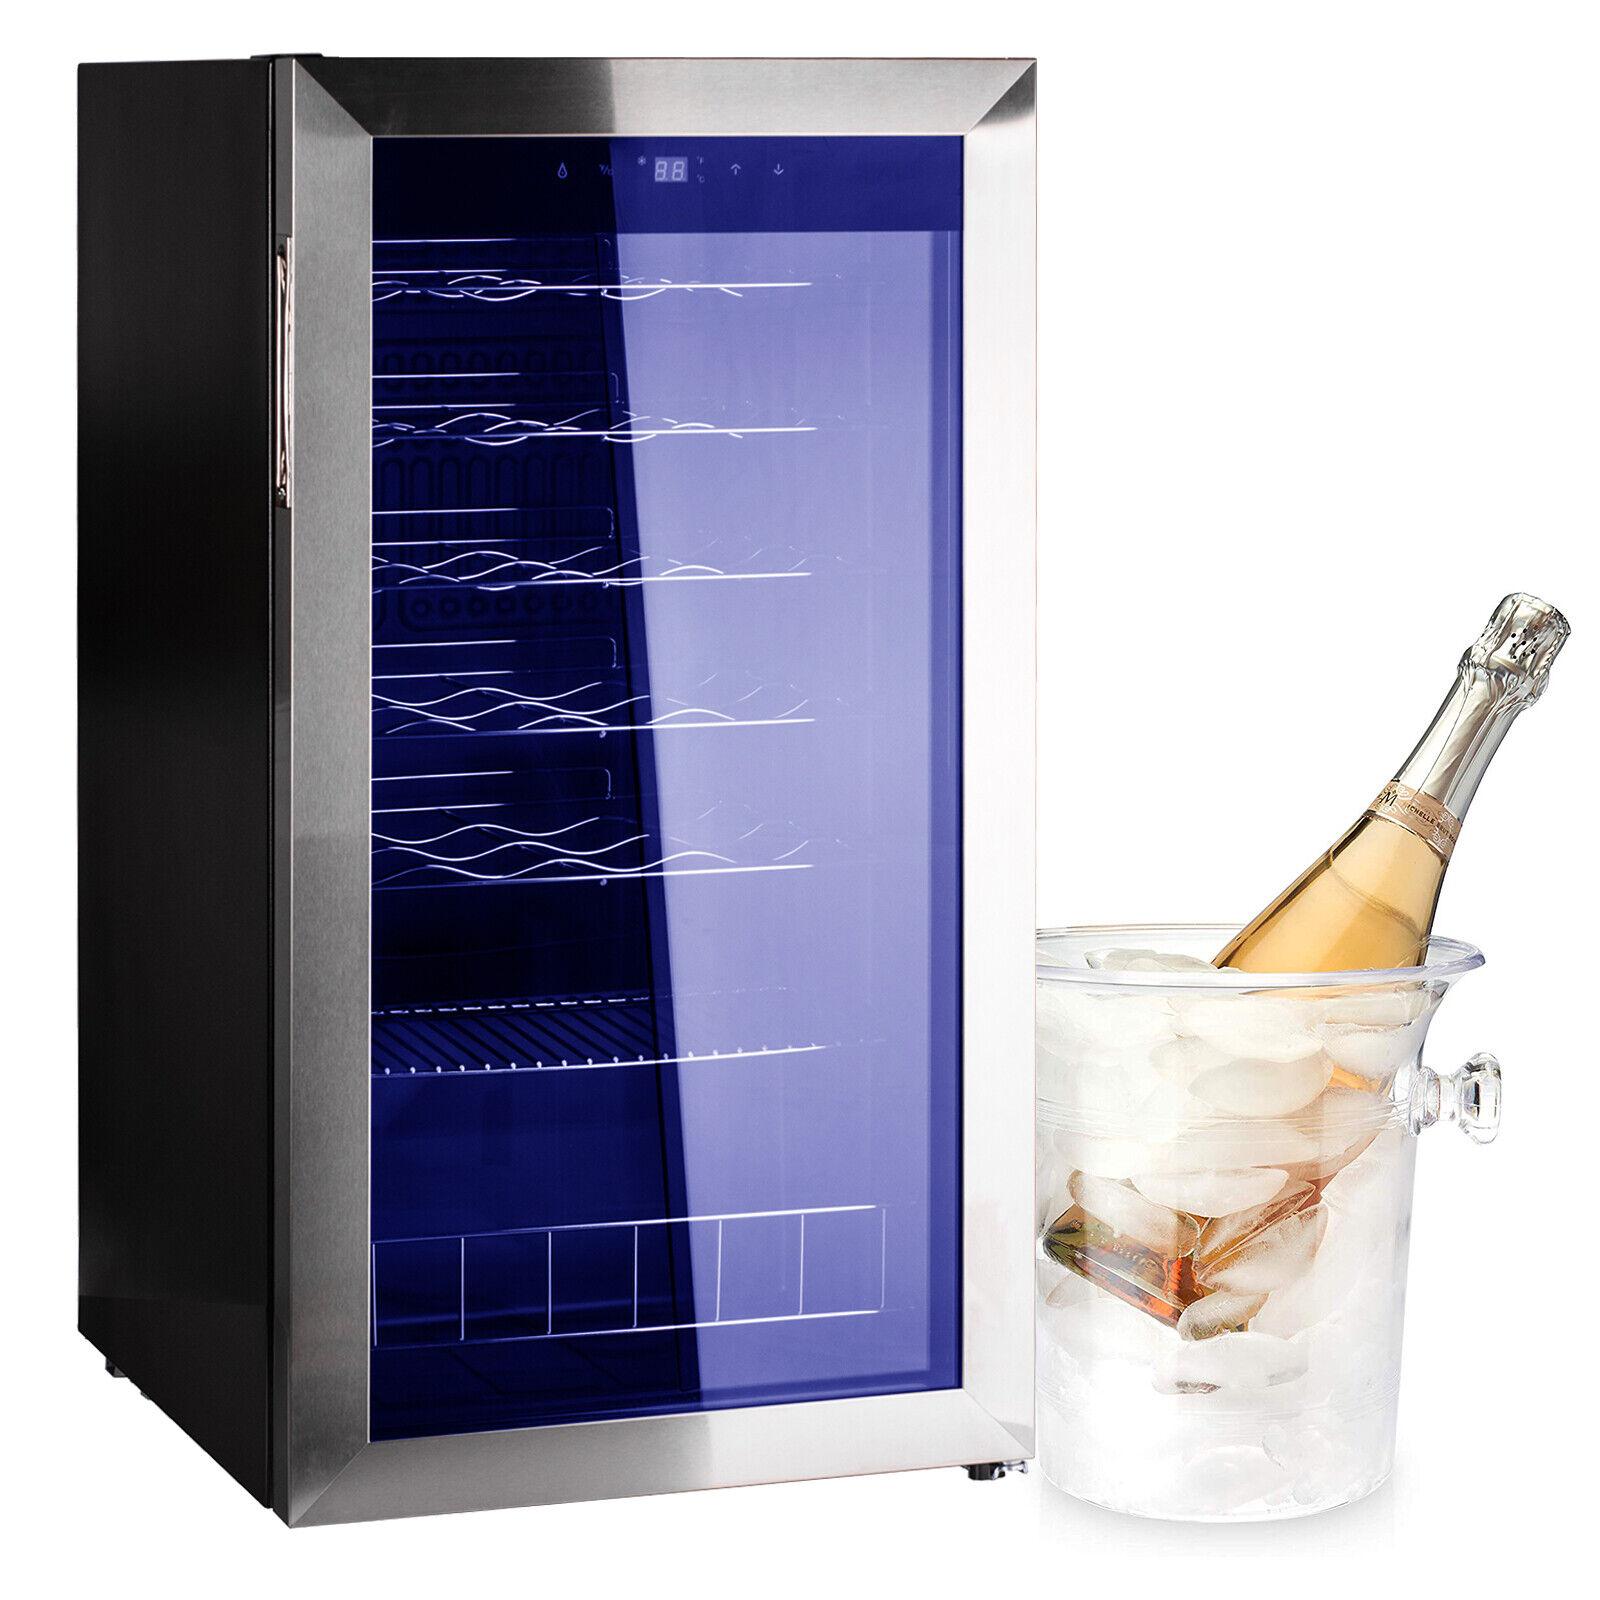 Wine Cooler Fridge 28 Bottle Black Refridgerator Beer Soda Bar Igloo For Sale Online Ebay